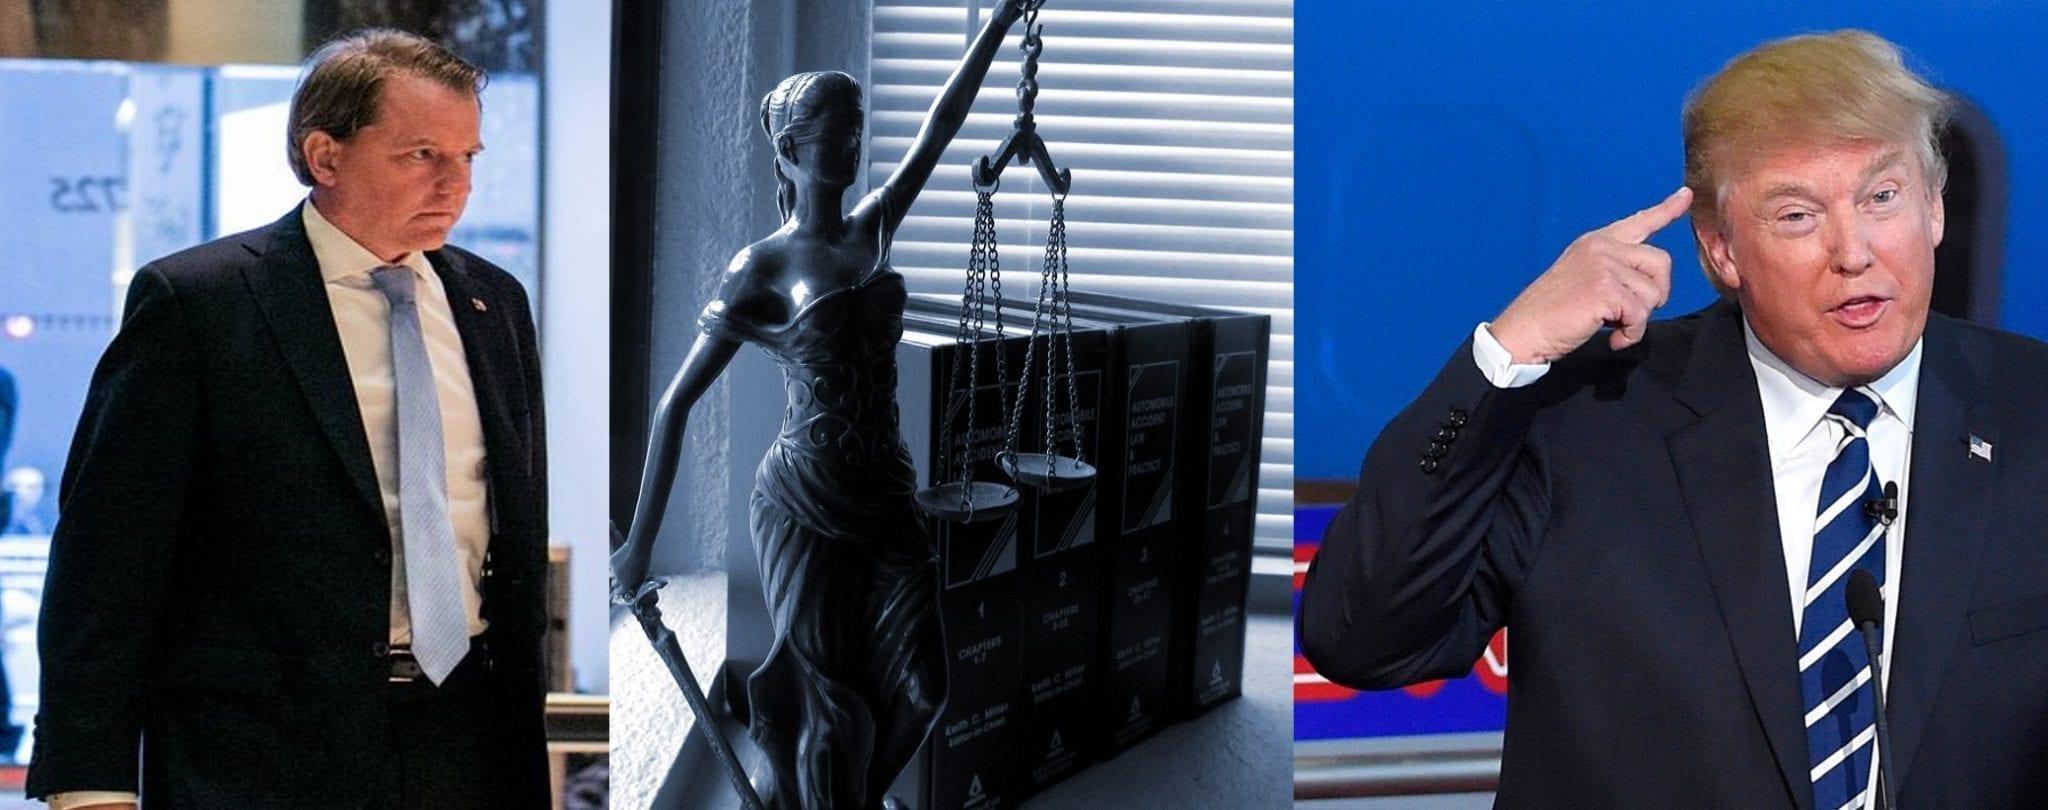 Images: McGahn - Sam Hodgson for www.nytimes.com; Lady Justice - jessica45 www.pixabay. com, CC0 Creative Commons; Trump - Mark J. Terrill, AP.